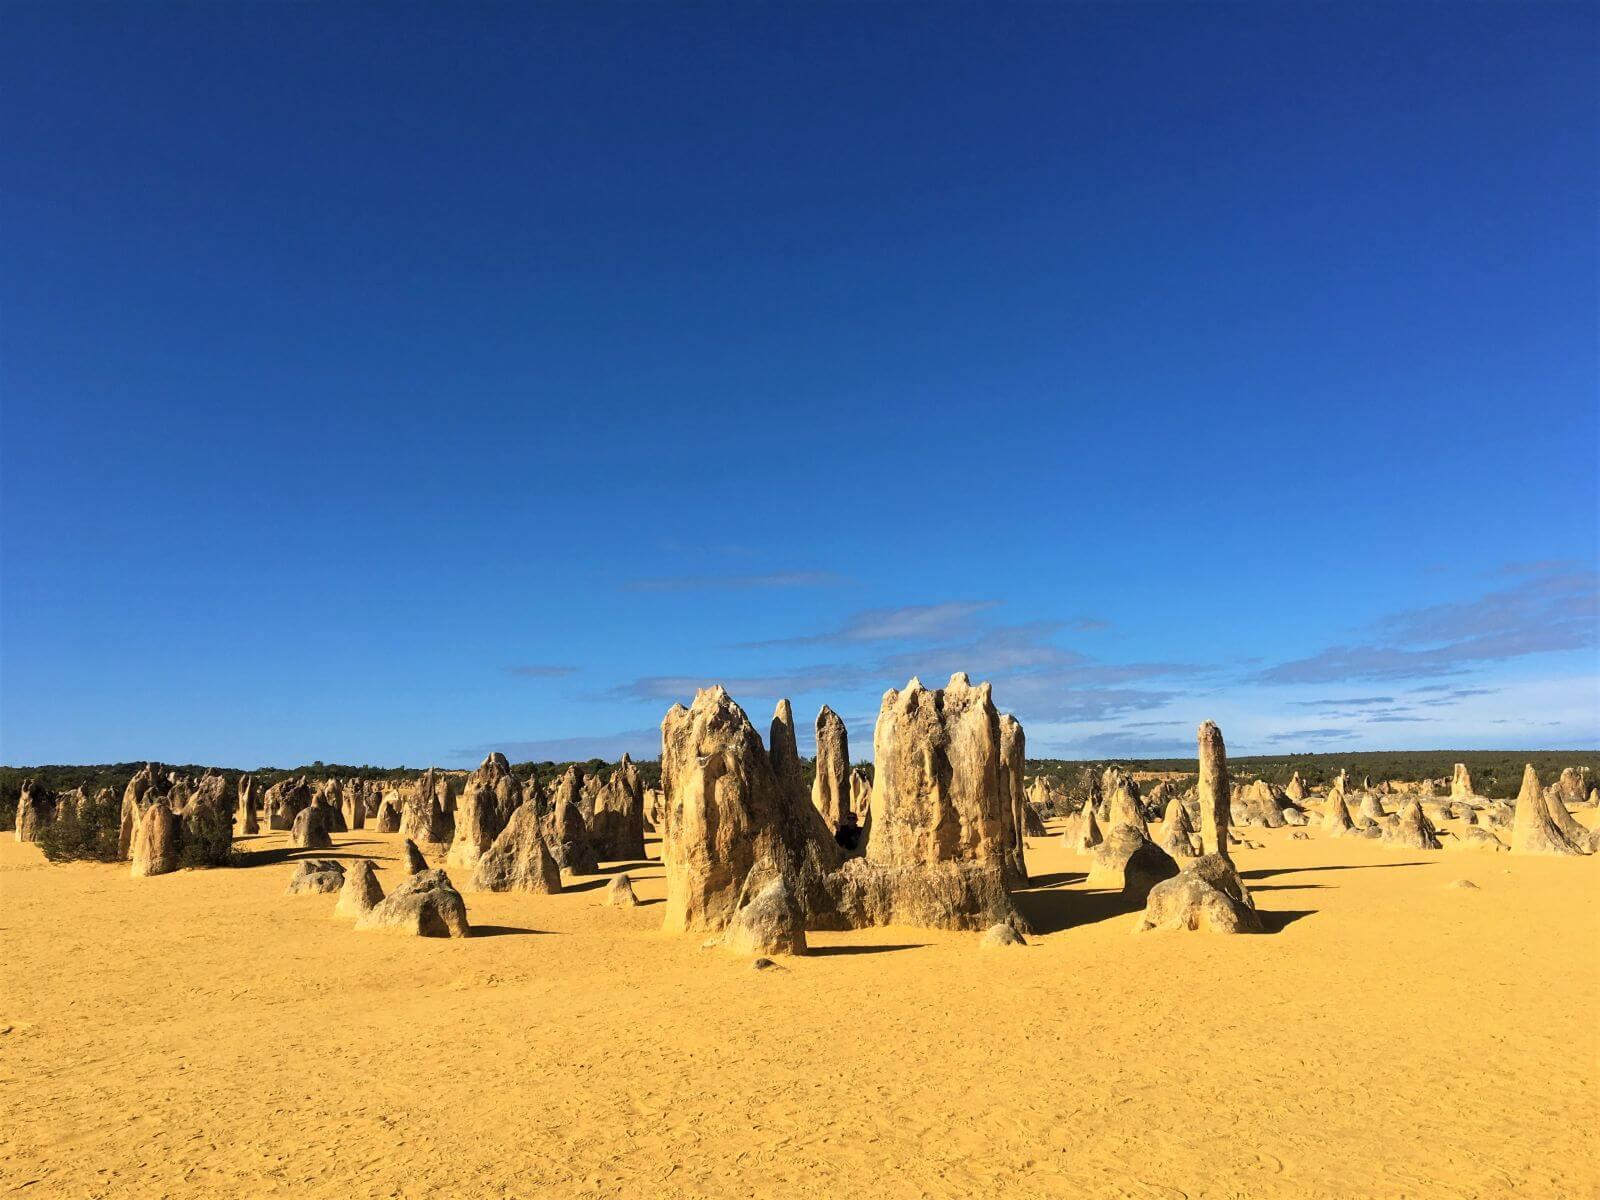 Nambung National Park - Pinnacles-Wüste